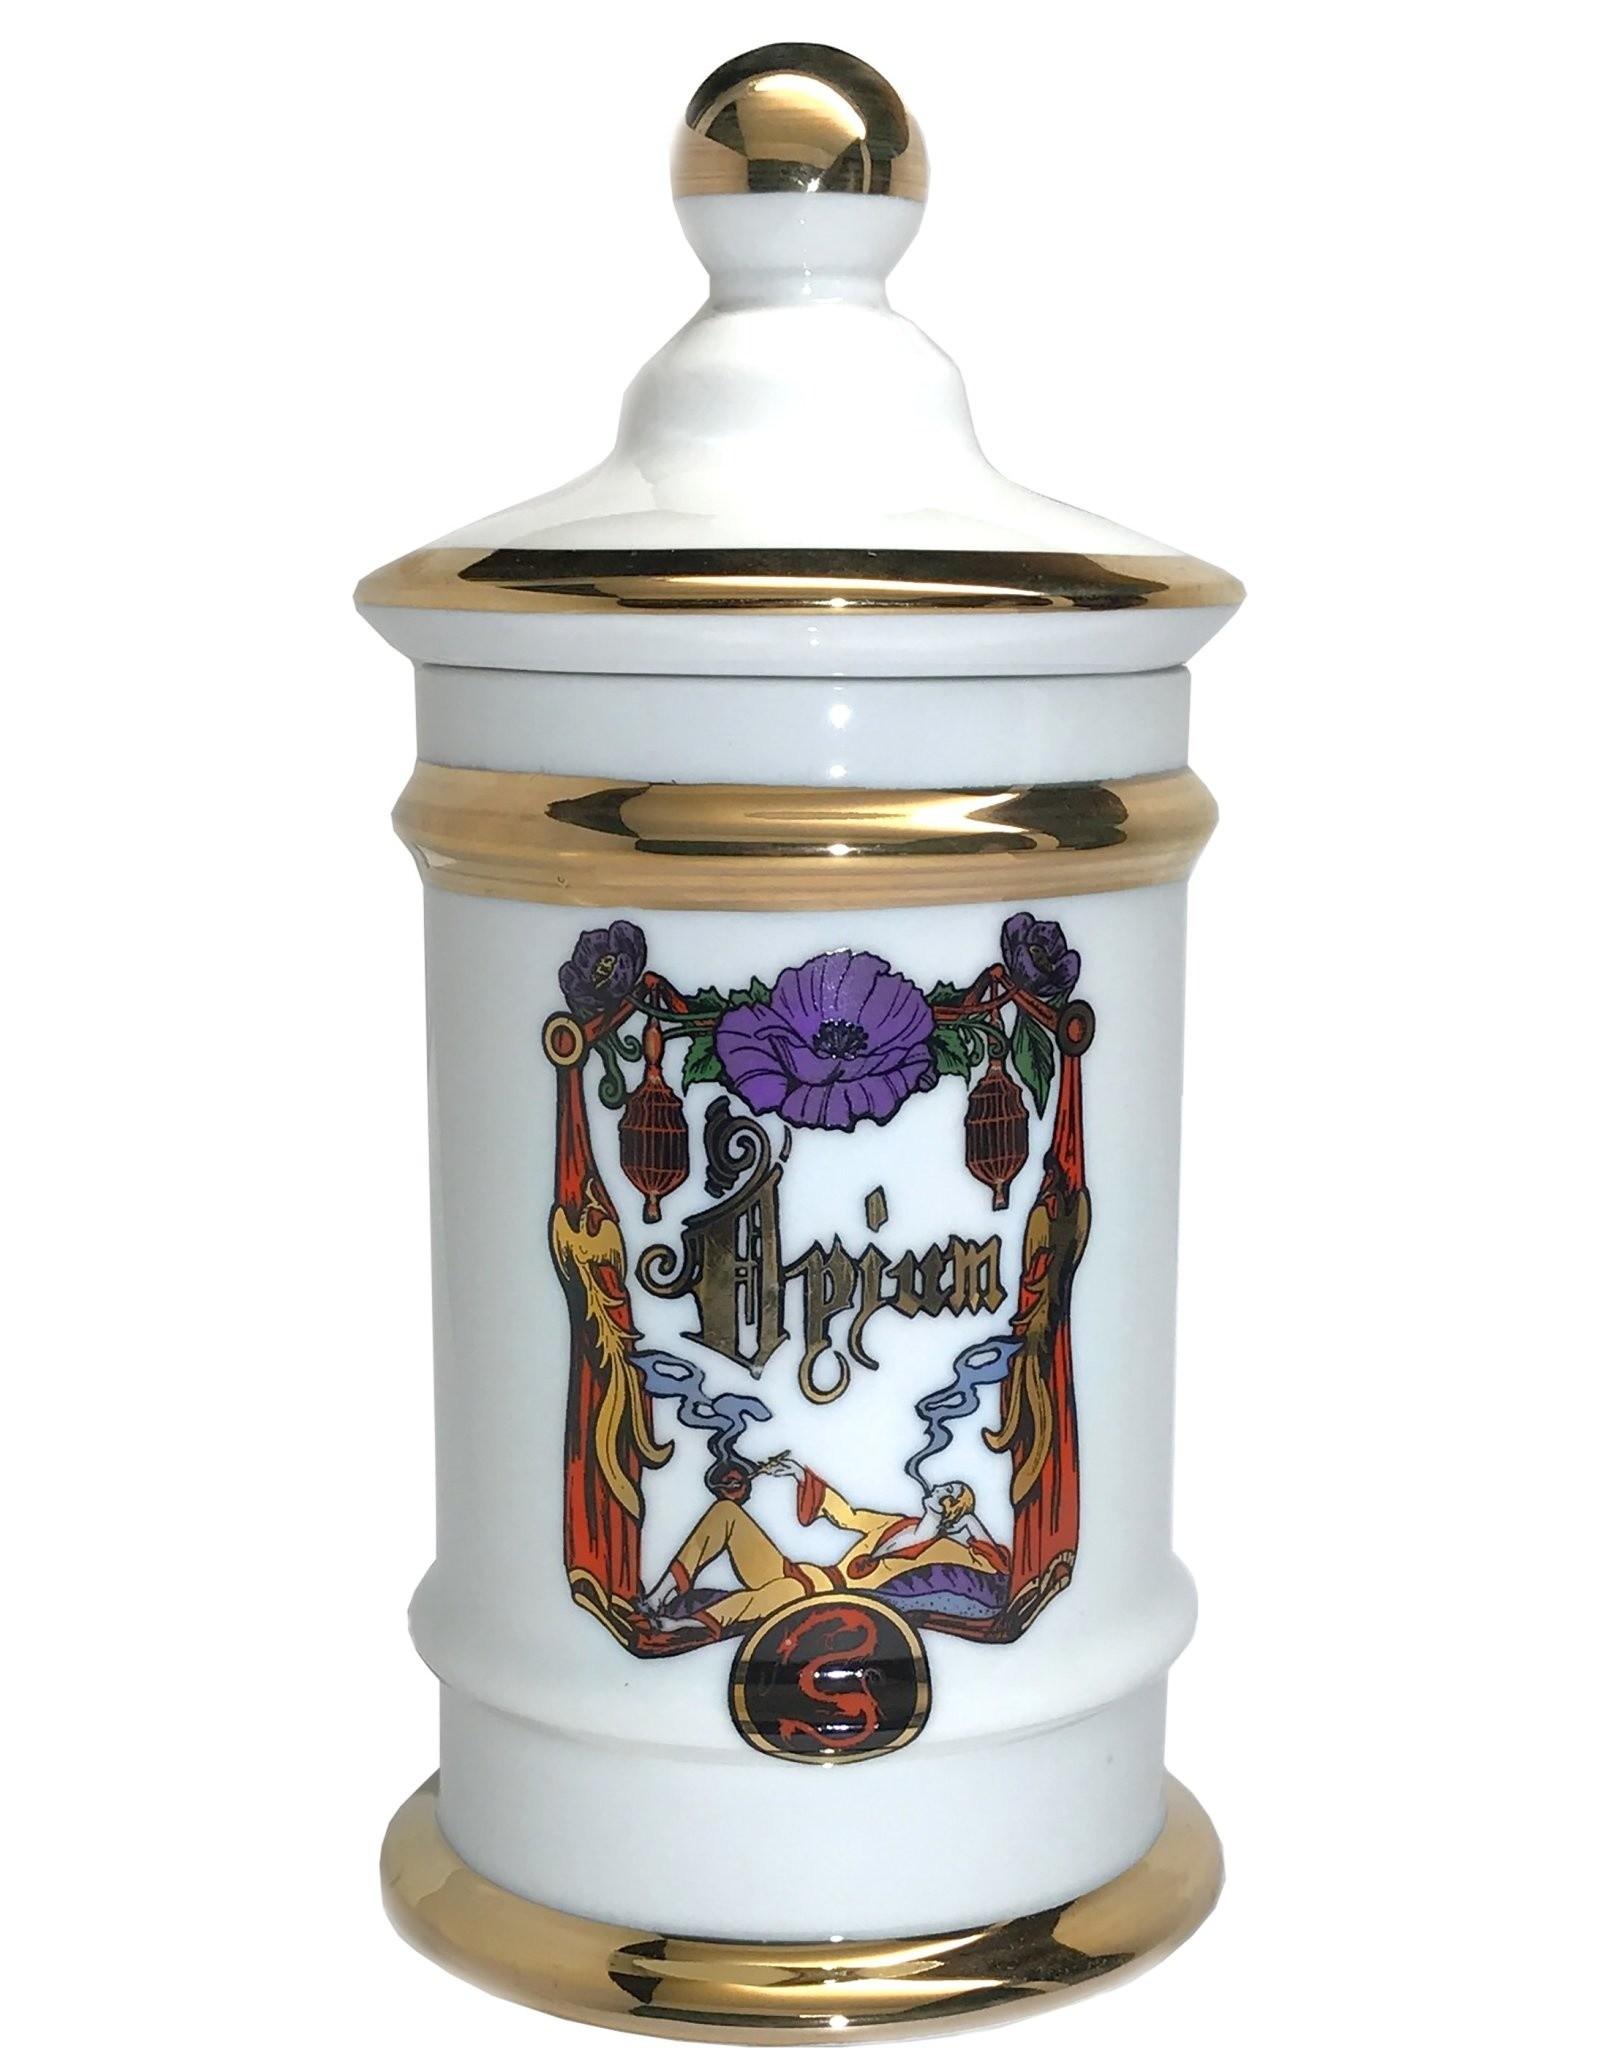 Spi-Gi Opium Candle Jar